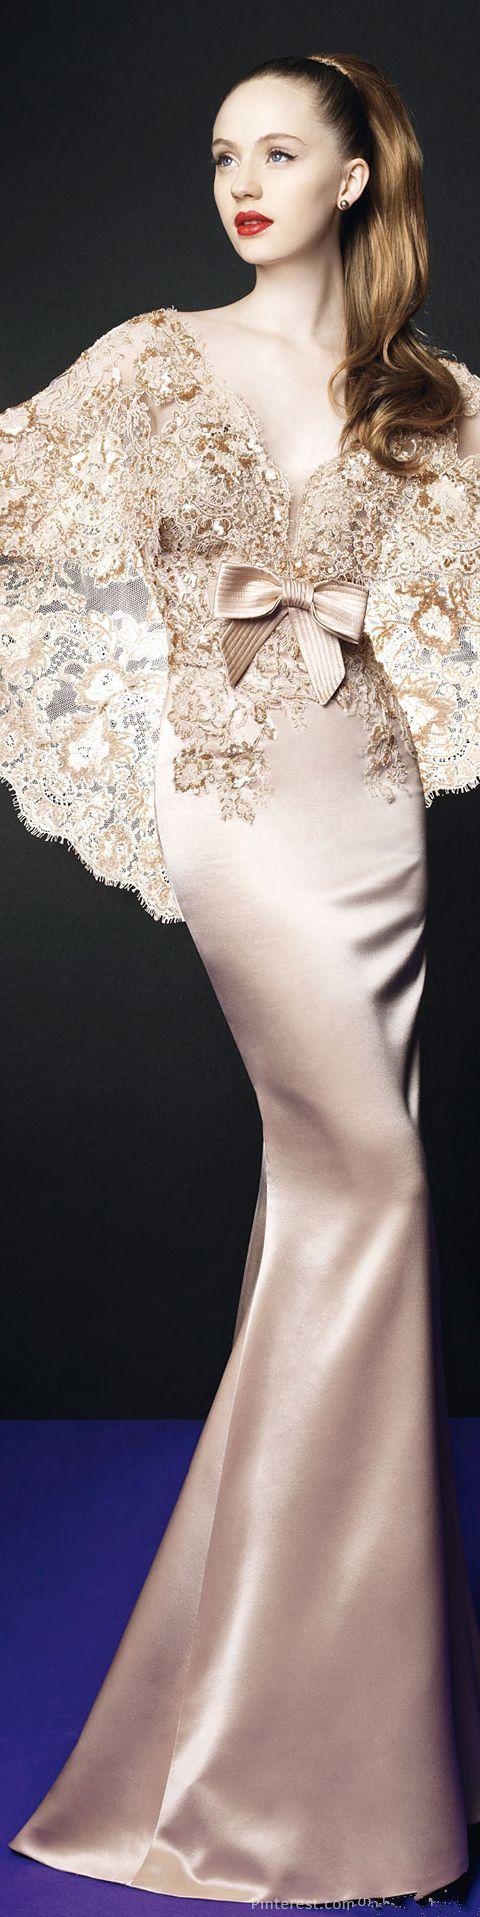 exquisite lace satin dress                                                                                                                                                                                 More